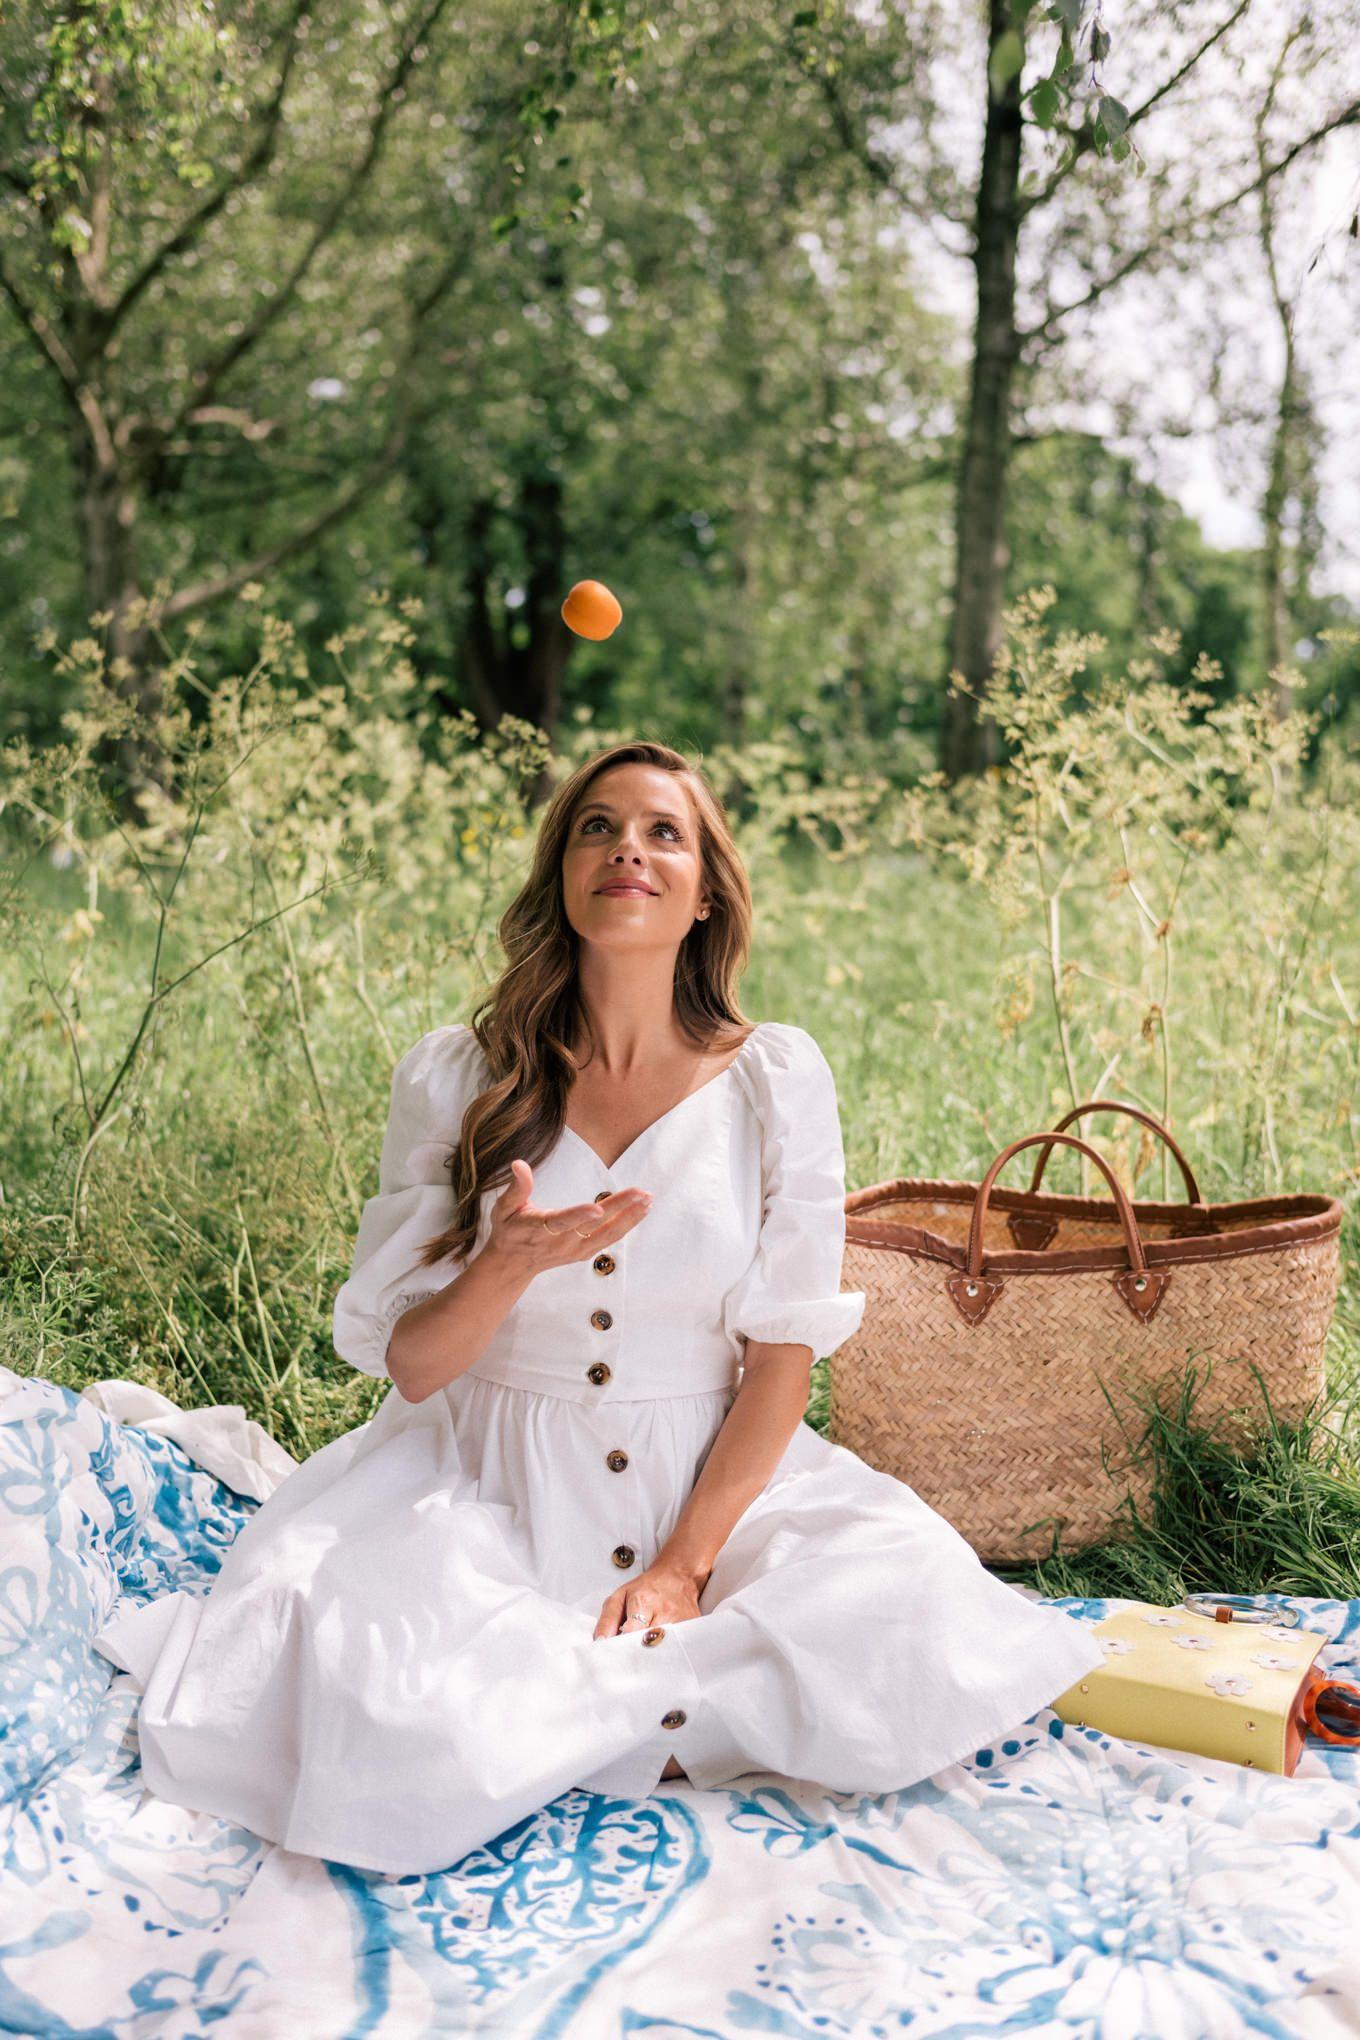 A Summer Picnic In Hyde Park Julia Berolzheimer Picnic Outfits Picnic Dress Picnic Outfit Summer [ 2040 x 1360 Pixel ]